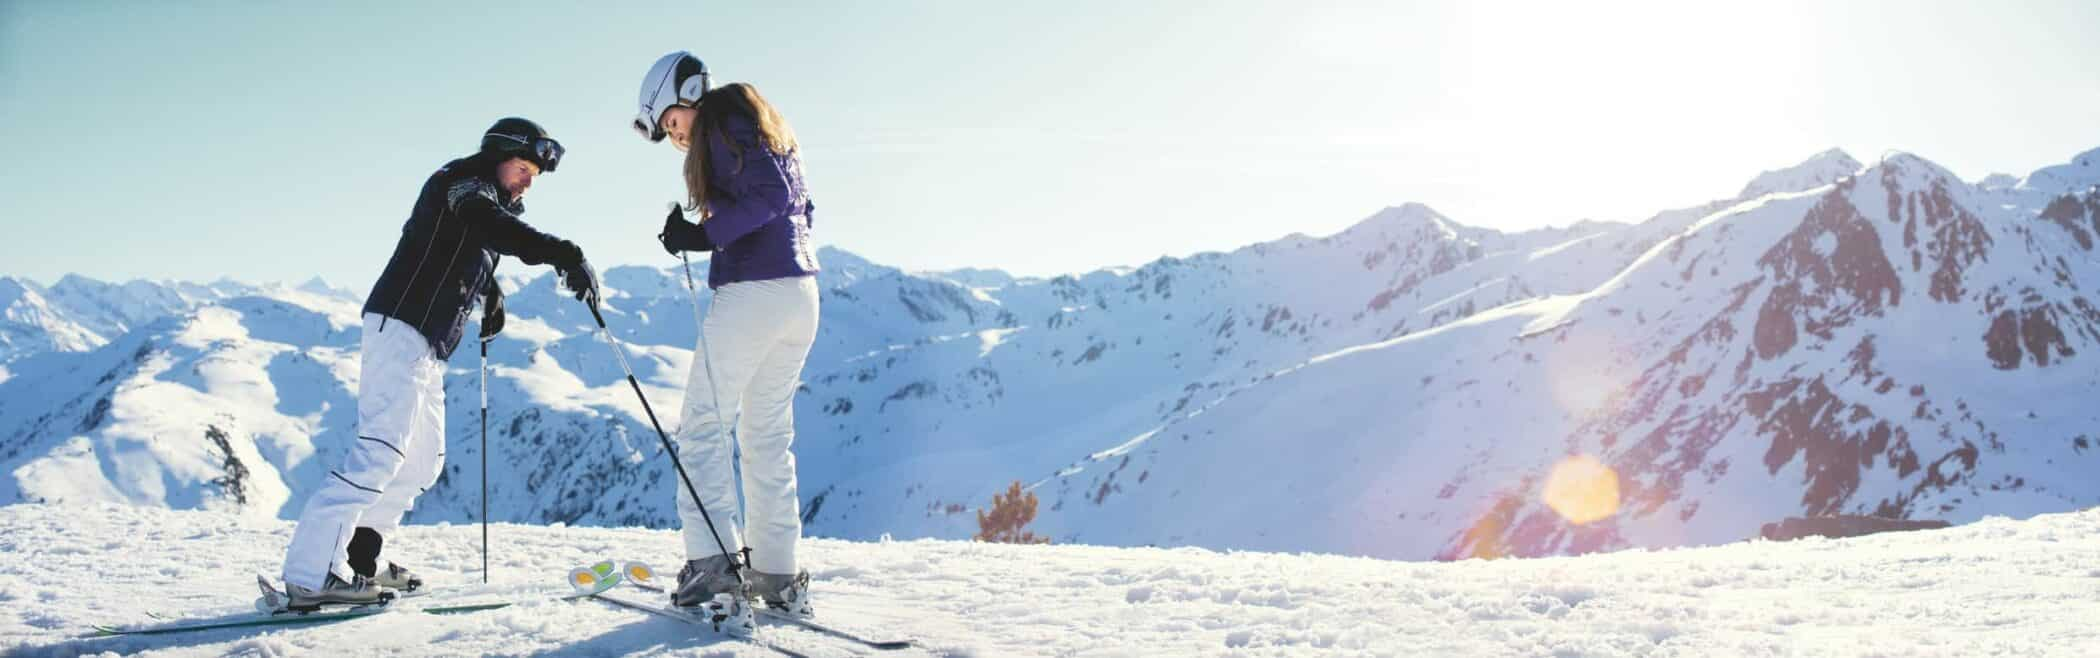 ZIllertal ski på toppen